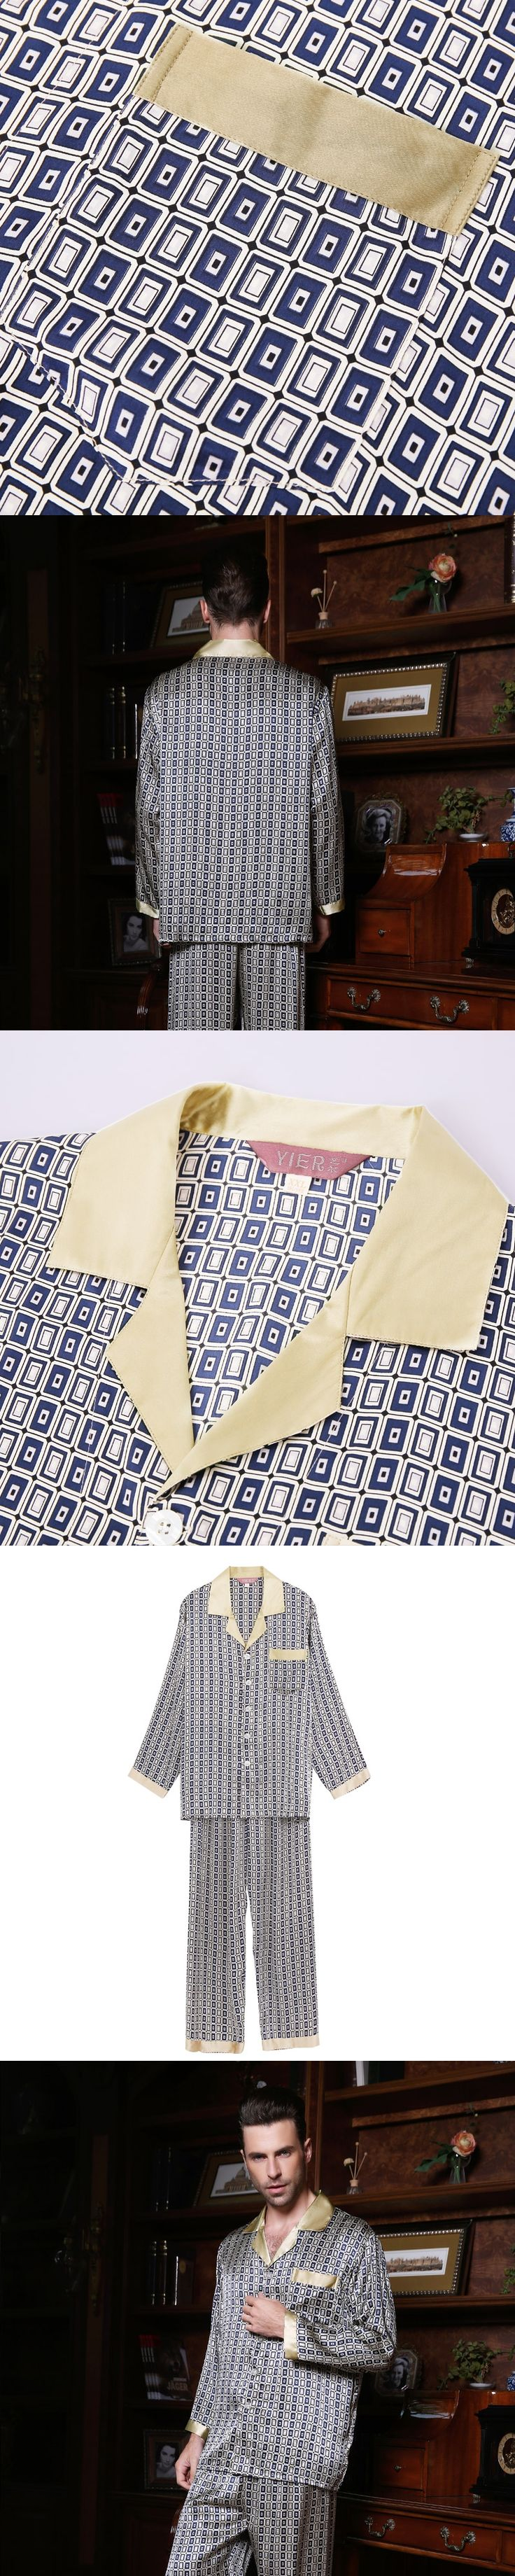 Wholesales Pure Silk Satin Sleepwear Sale Long-Sleeve Men Pyjamas Pajama Sets Pants 100% Natural Silk Pajamas Set YF2631